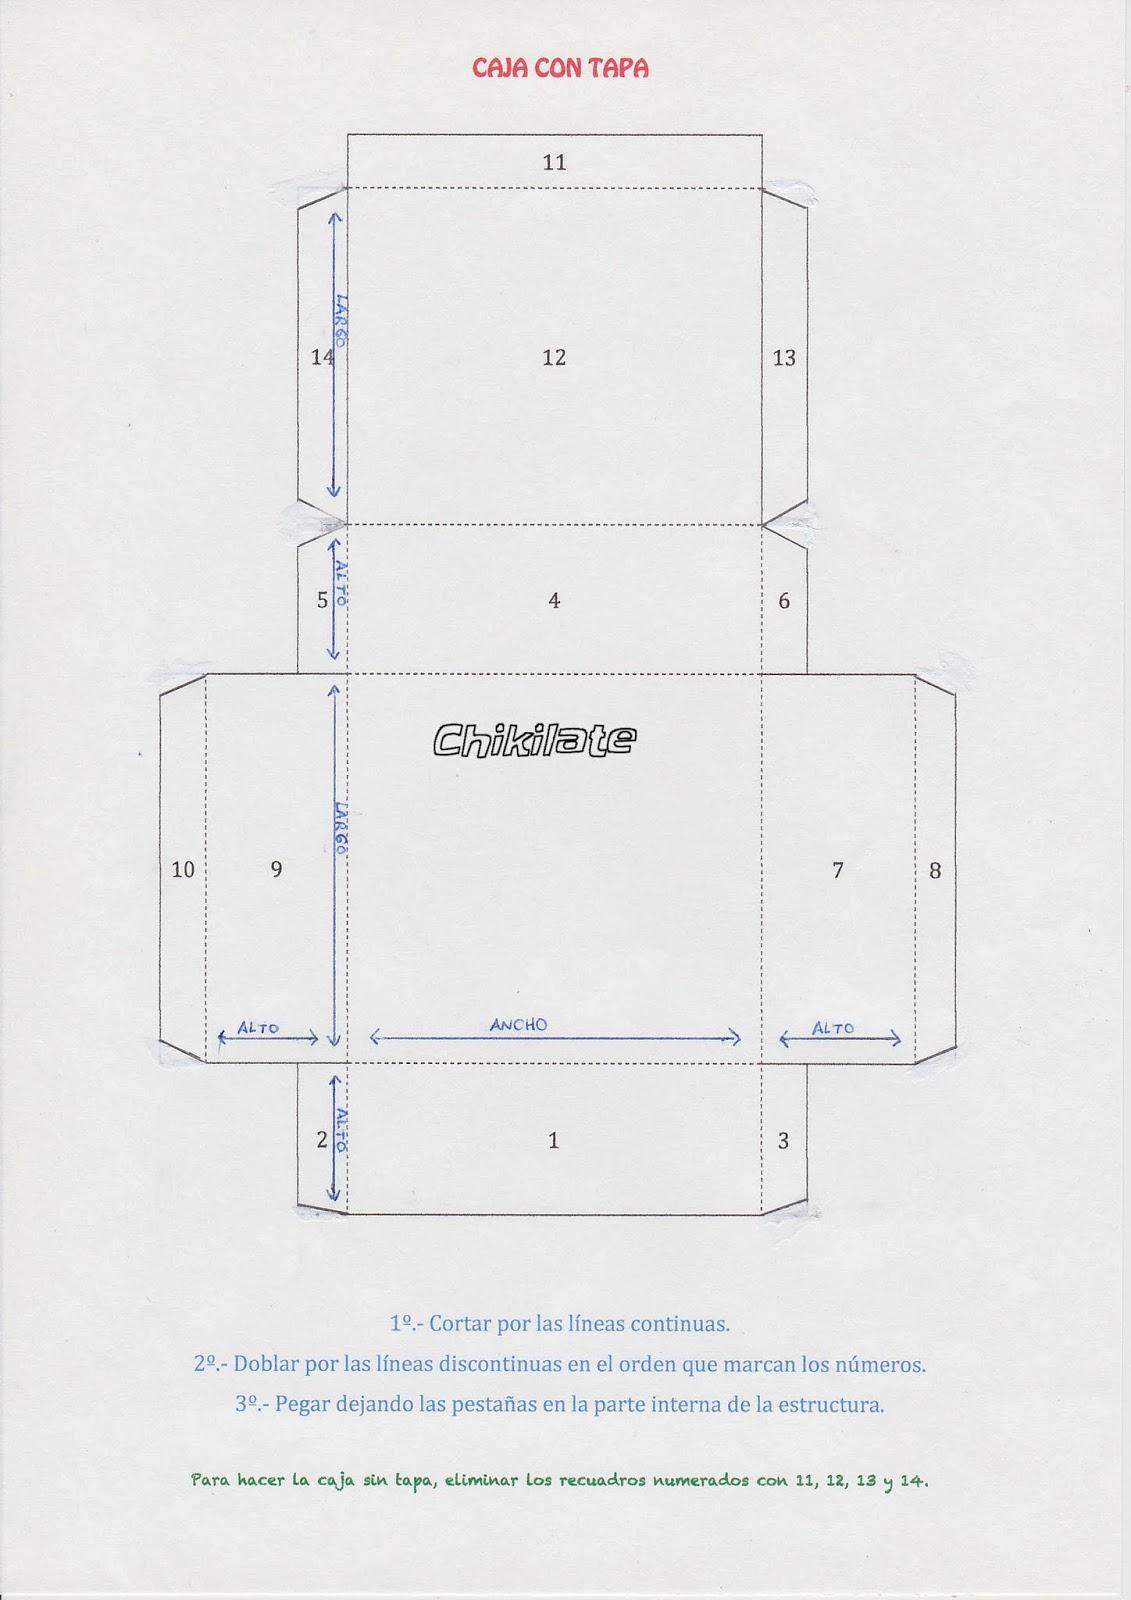 Chikilate: Cajas de cartón